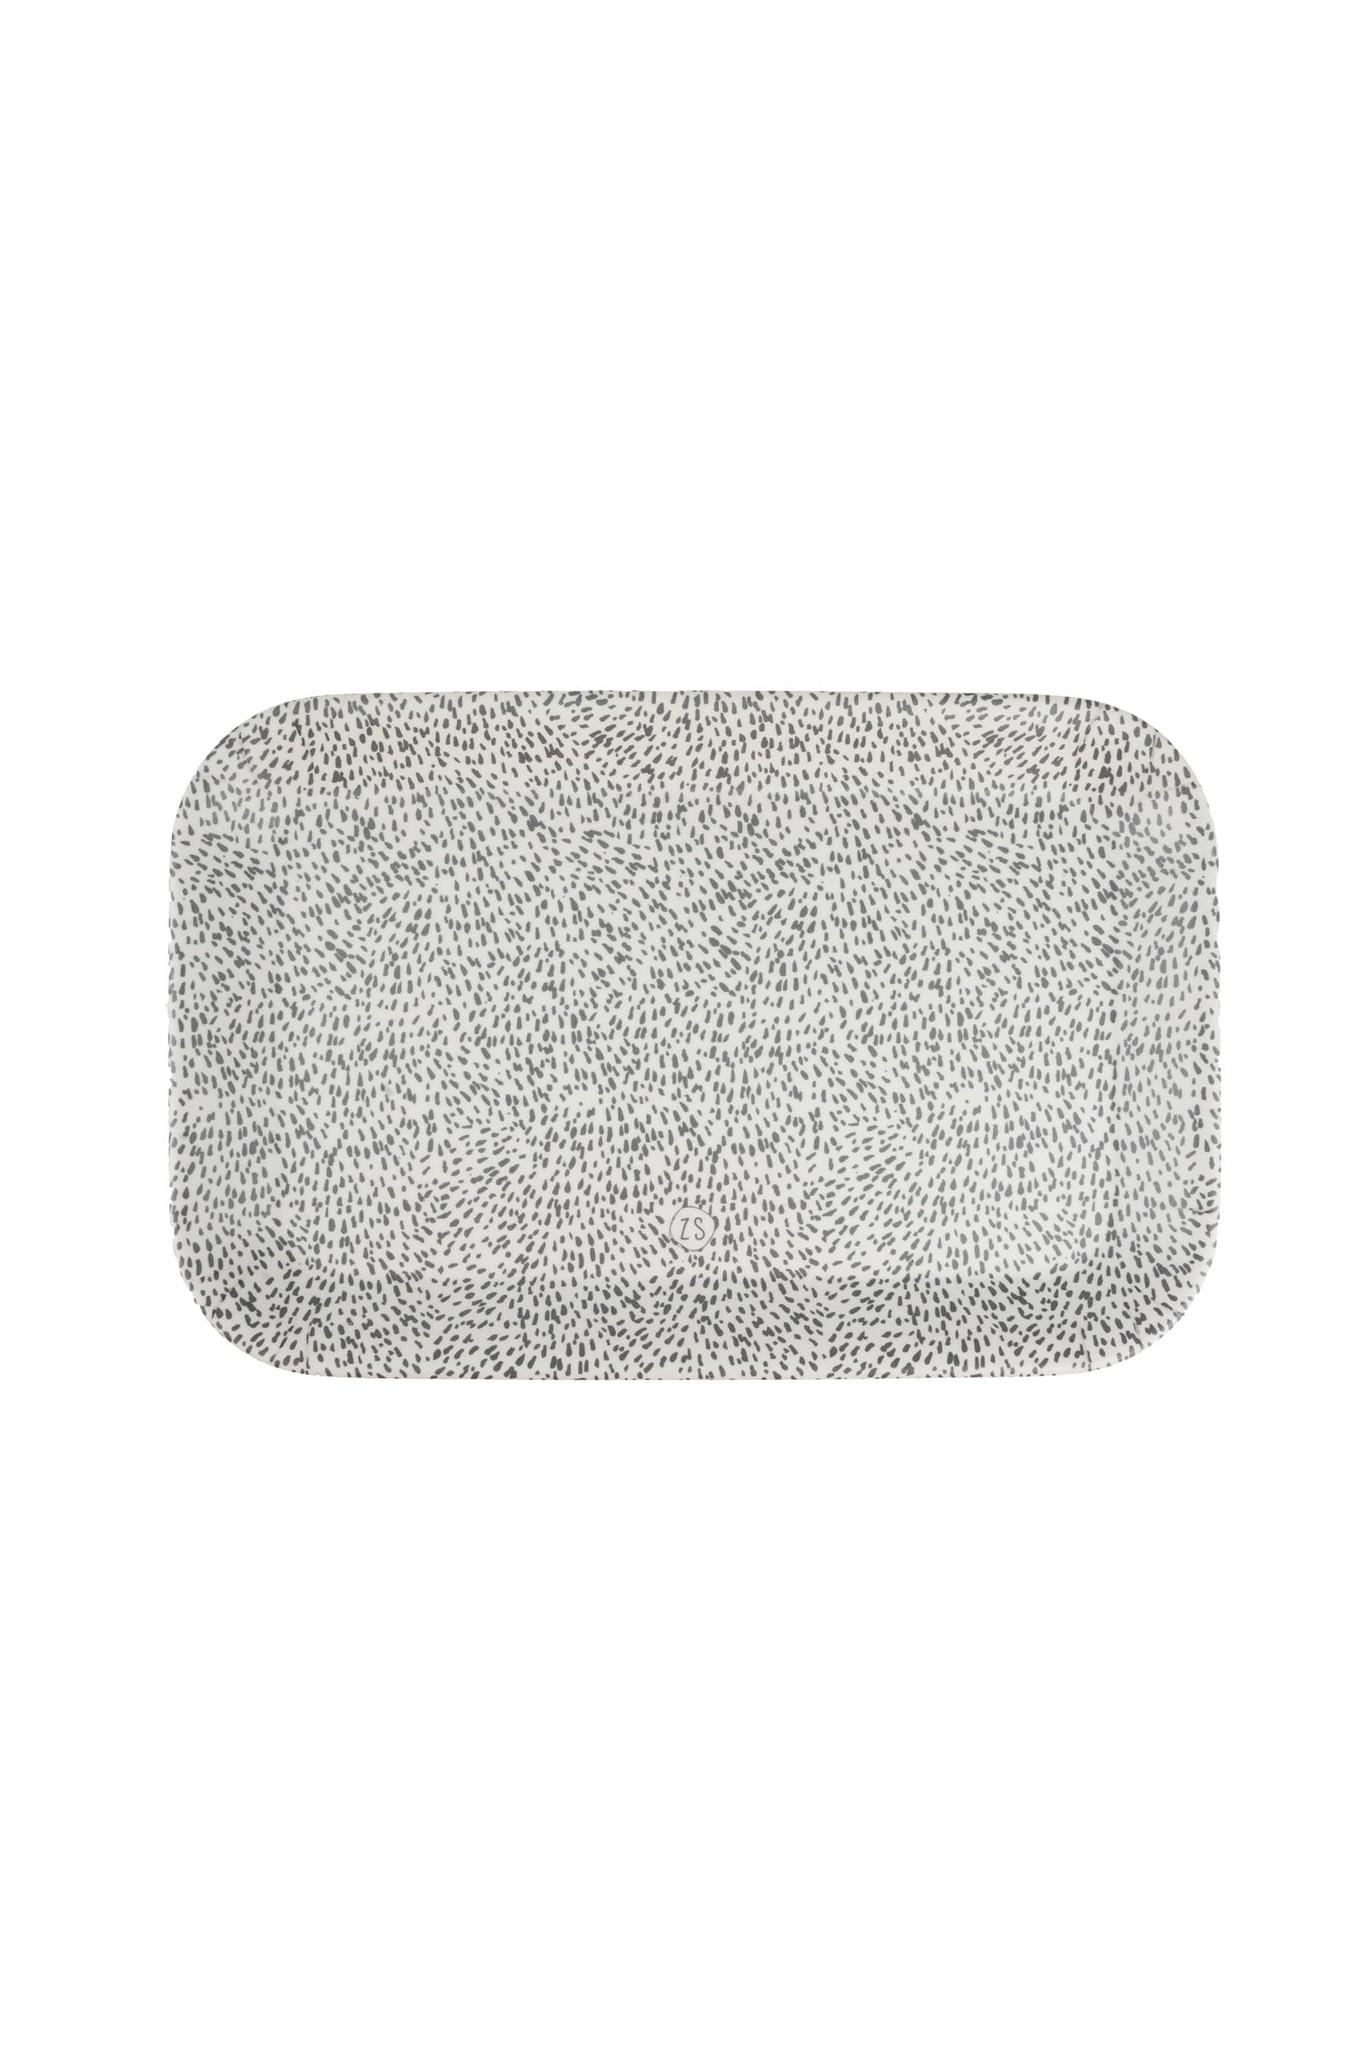 Dienblad spikkels 29x19cm Zusss